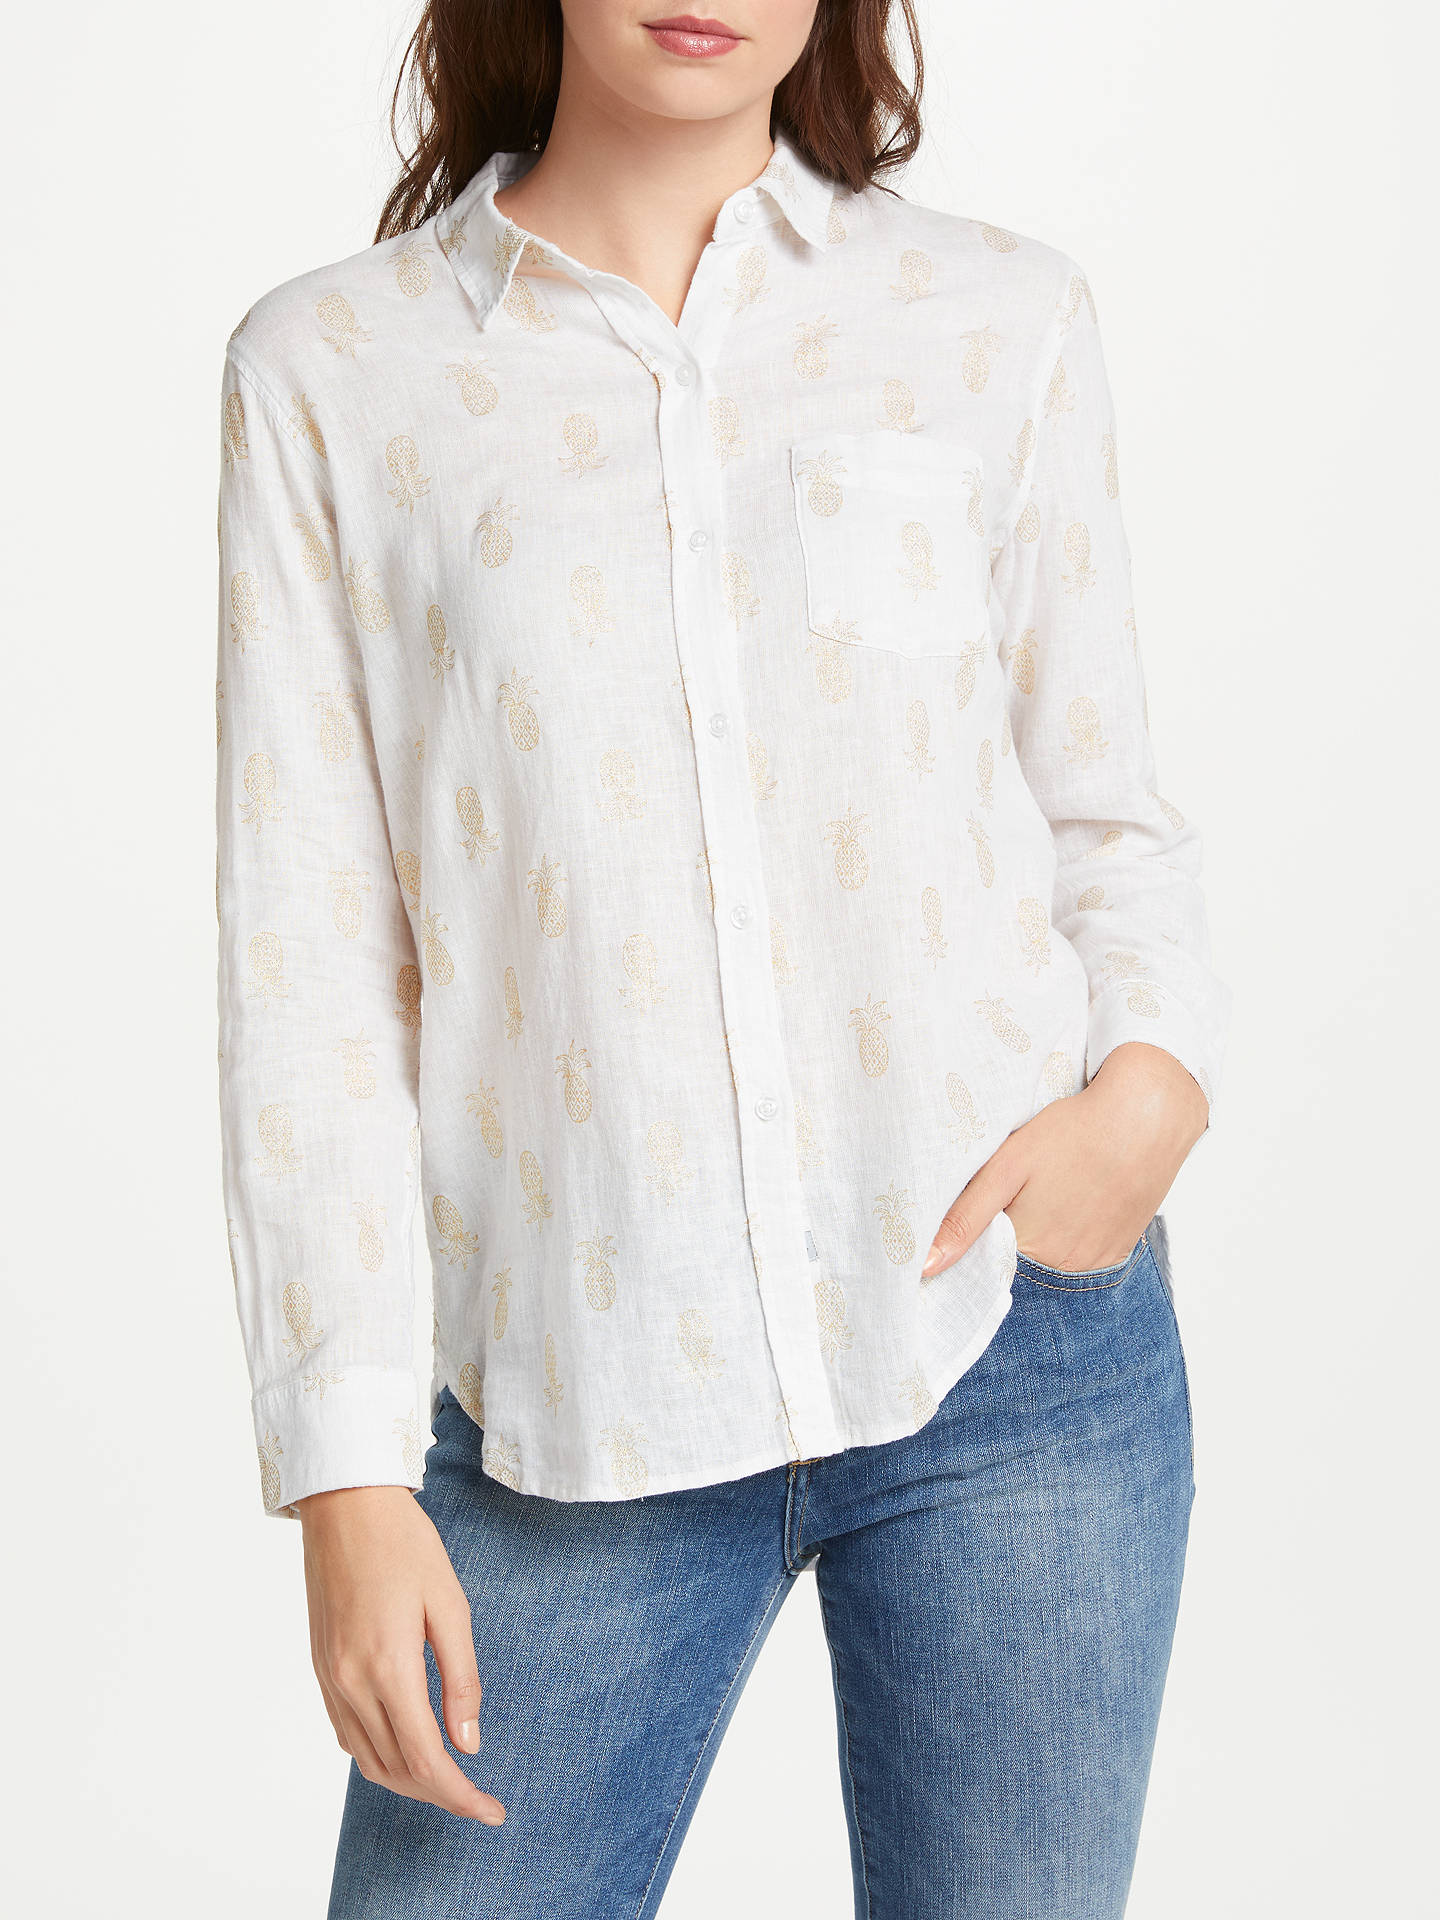 53b8744dc7a7 Buy Rails Charli Shirt, Gold Pineapples, XS Online at johnlewis.com ...